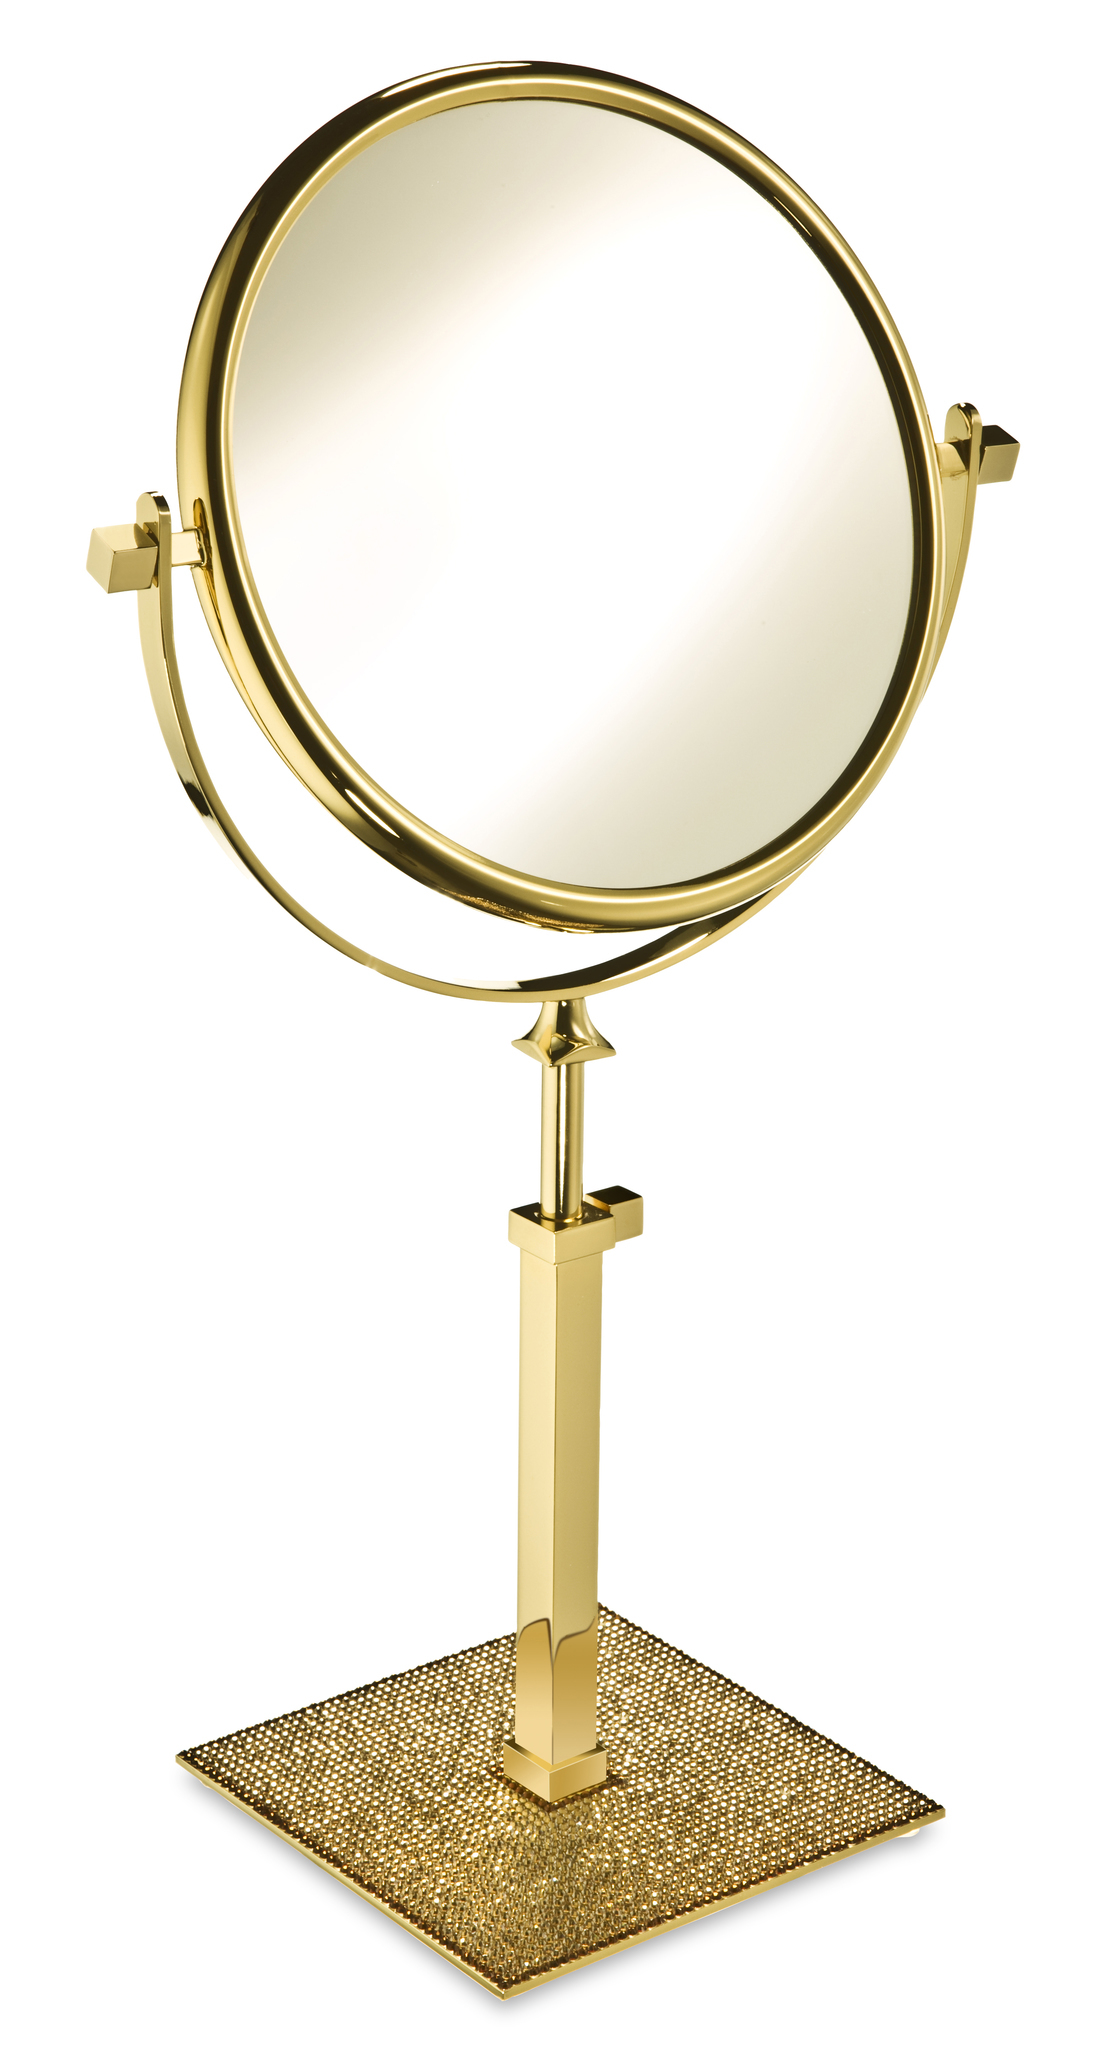 Зеркала Зеркало косметическое Windisch 99535O 5X Starlight elitnoe-zerkalo-kosmeticheskoe-99535-starlight-ot-windisch-ispaniya.jpg